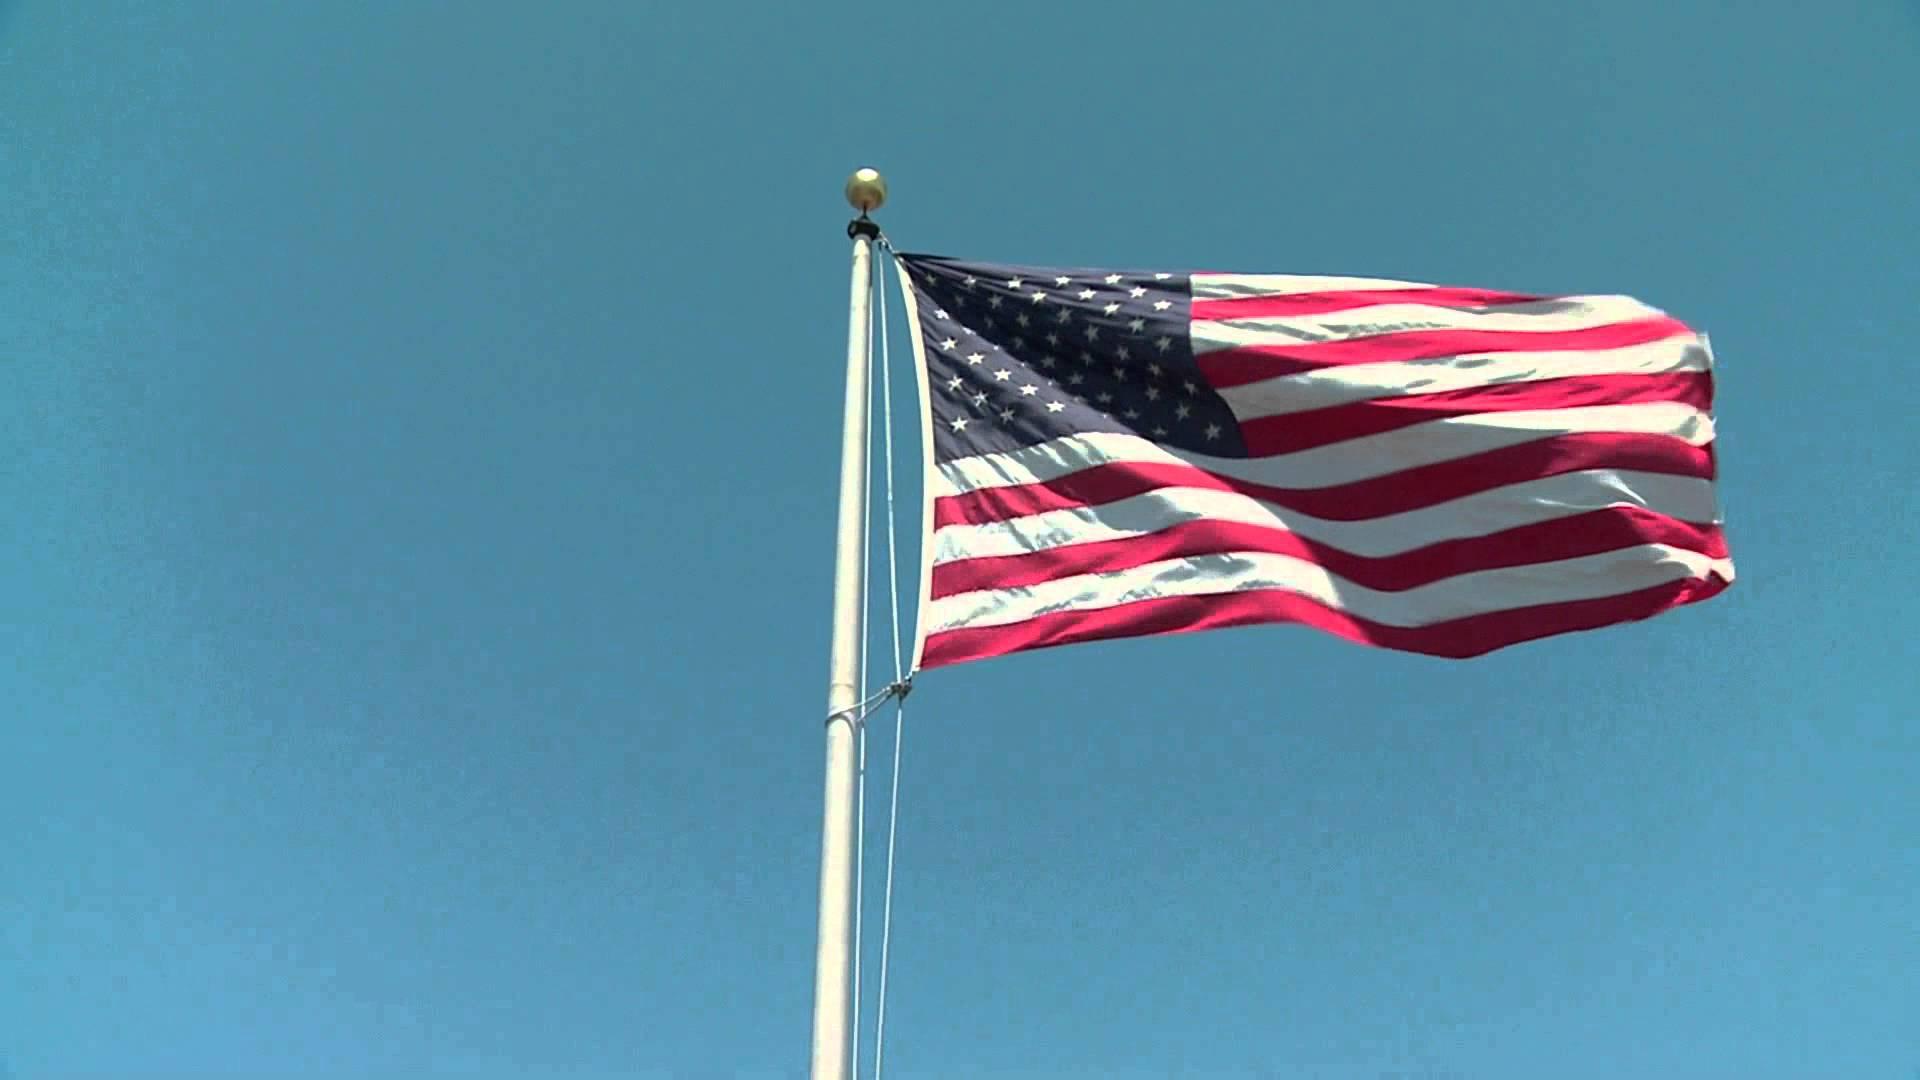 بالصور صور علم امريكا , اجمل صور لعلم امريكا 980 5